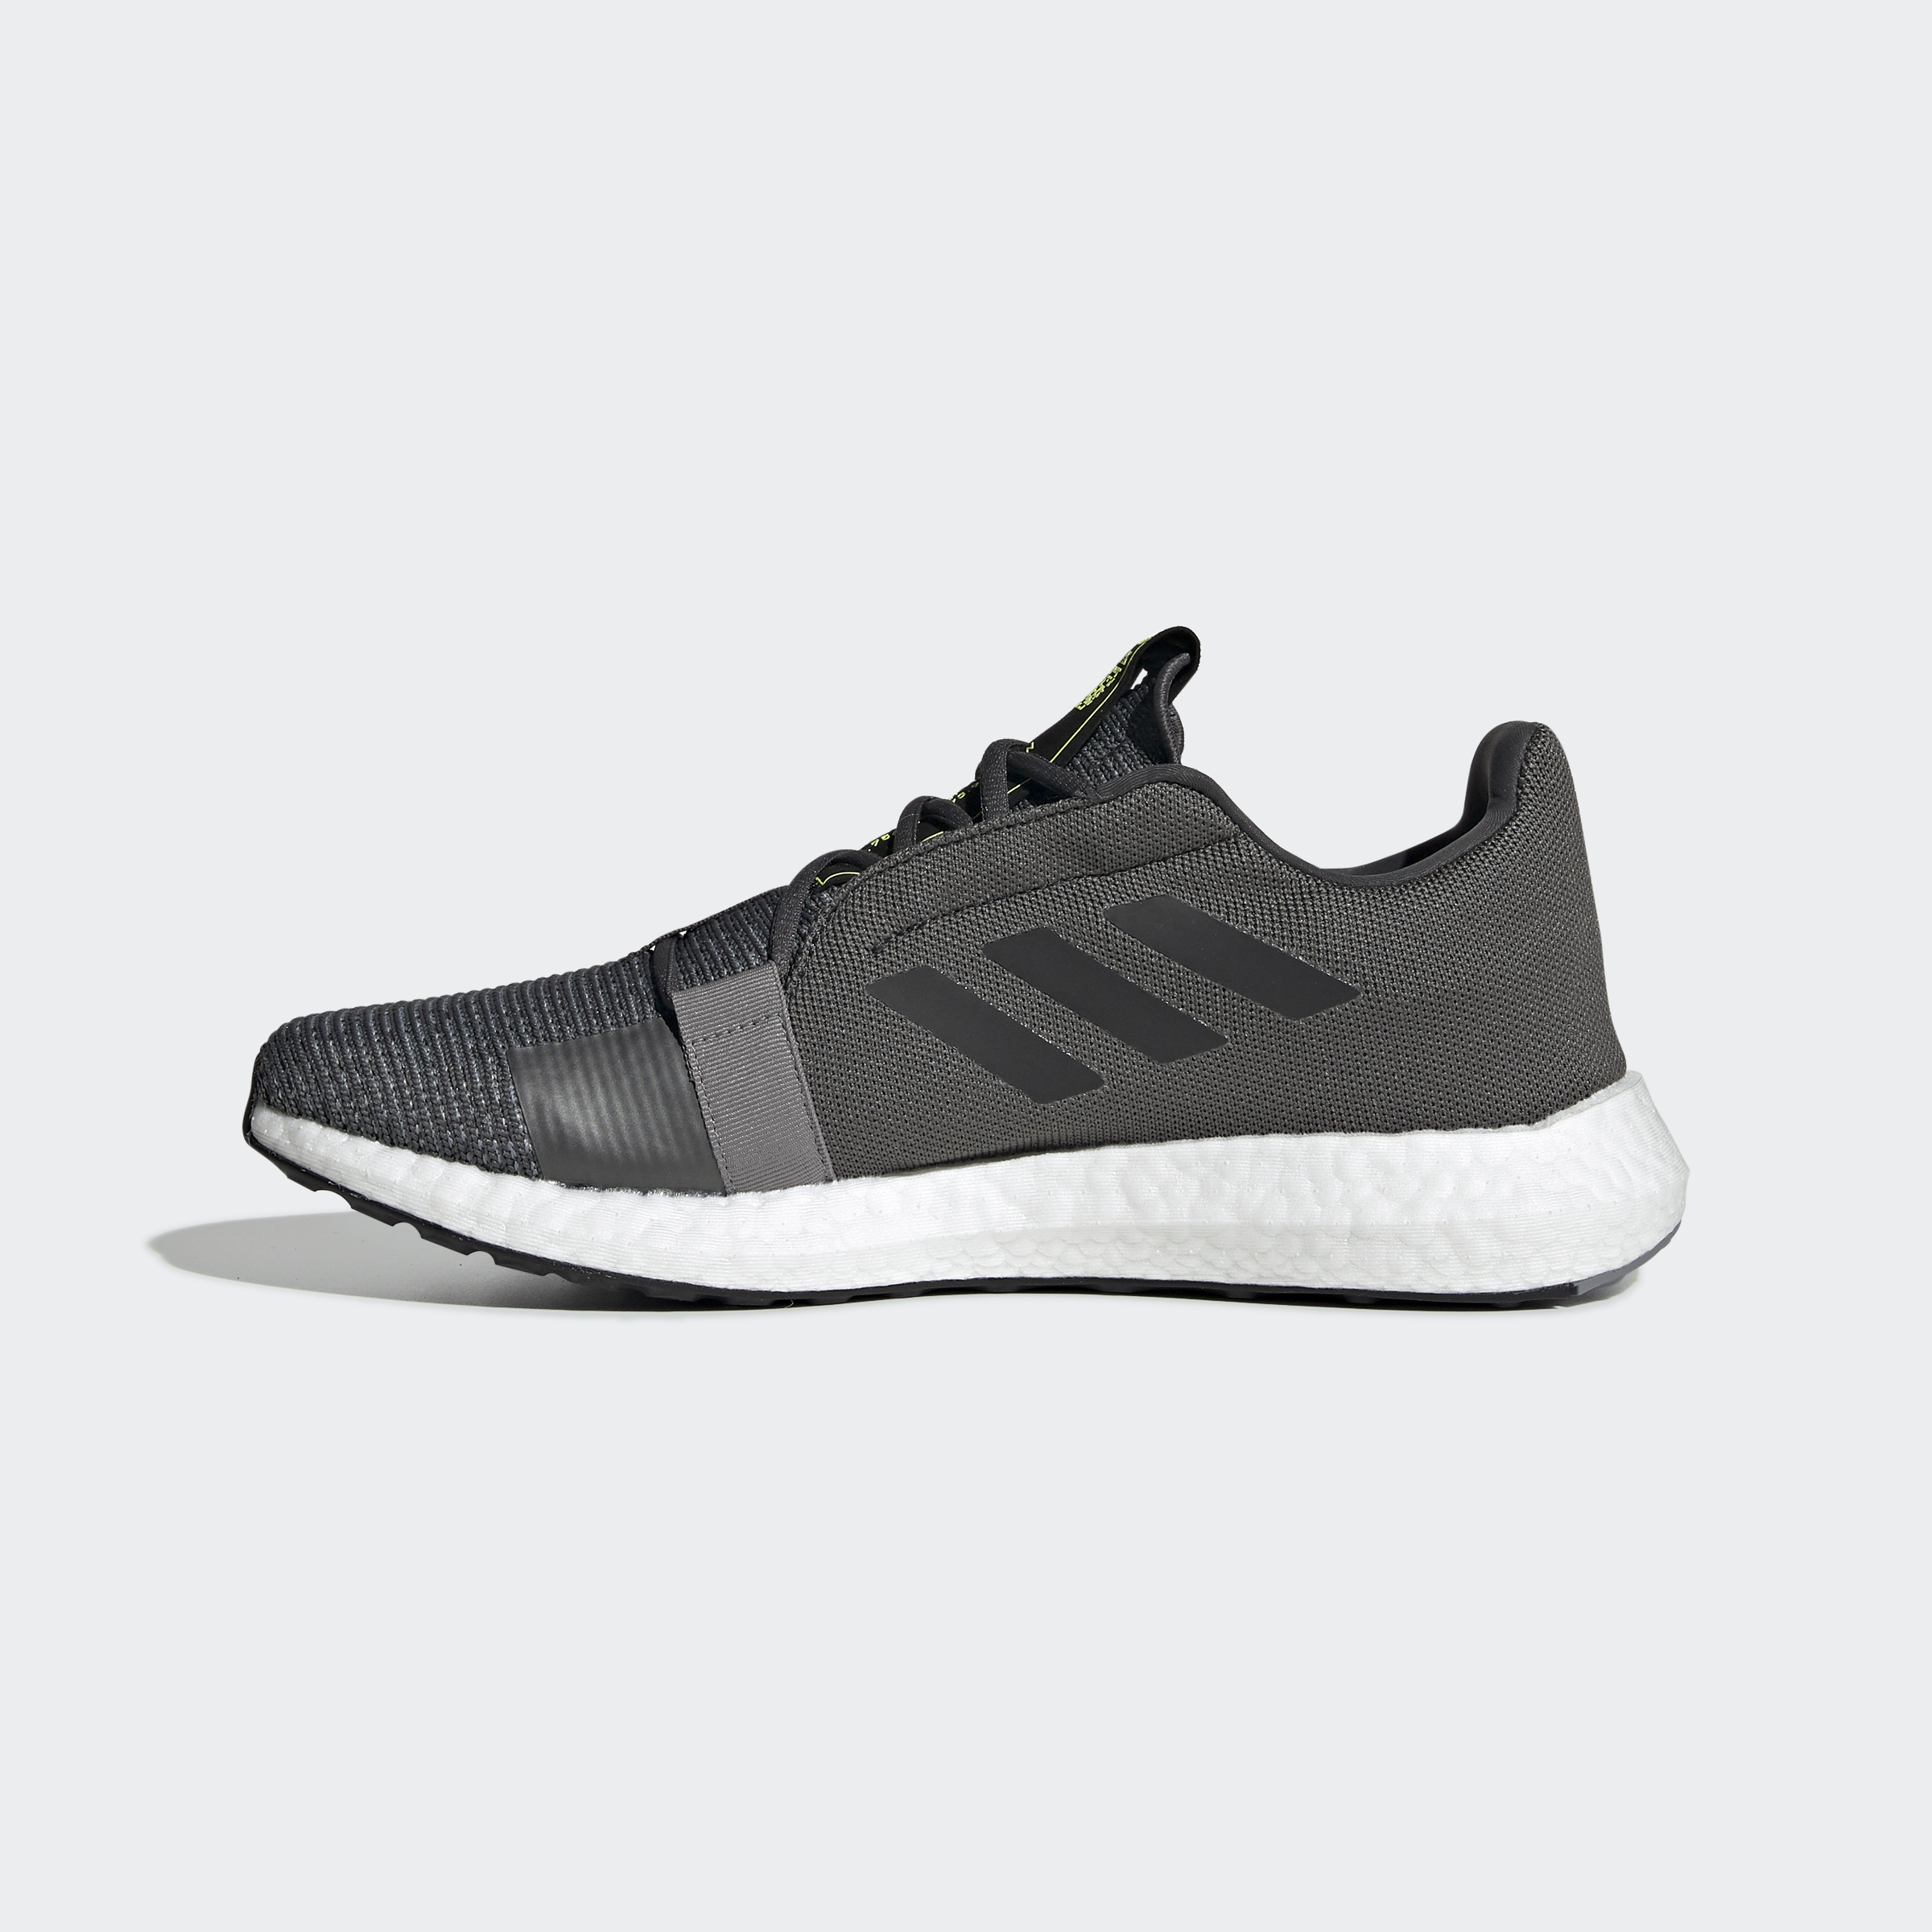 miniature 18 - adidas Senseboost Go Shoes Men's Athletic & Sneakers